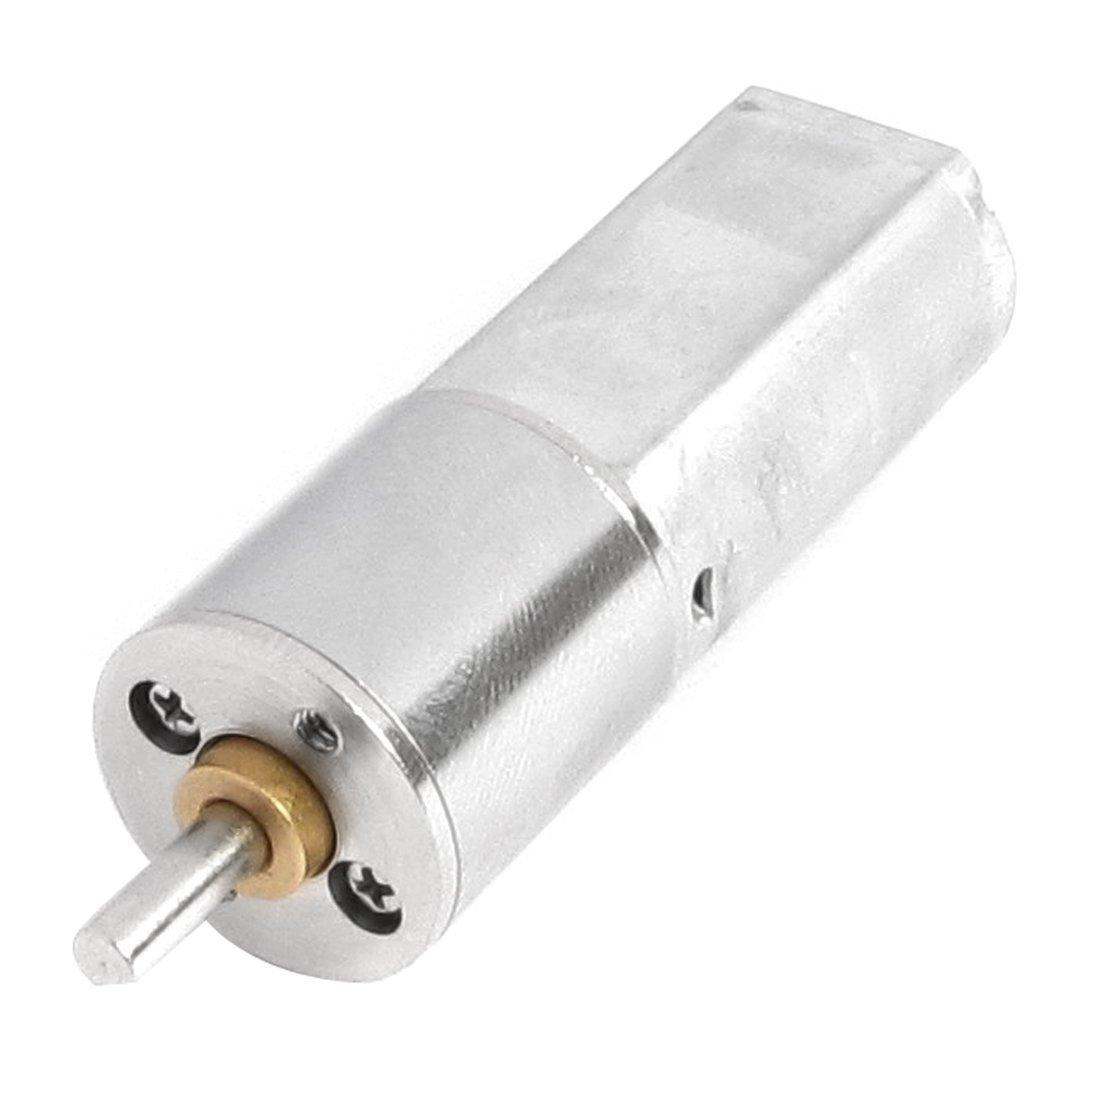 uxcell 12V 60RPM 3mm Shaft 16mm Diameter DC Geared Motor w Gearbox